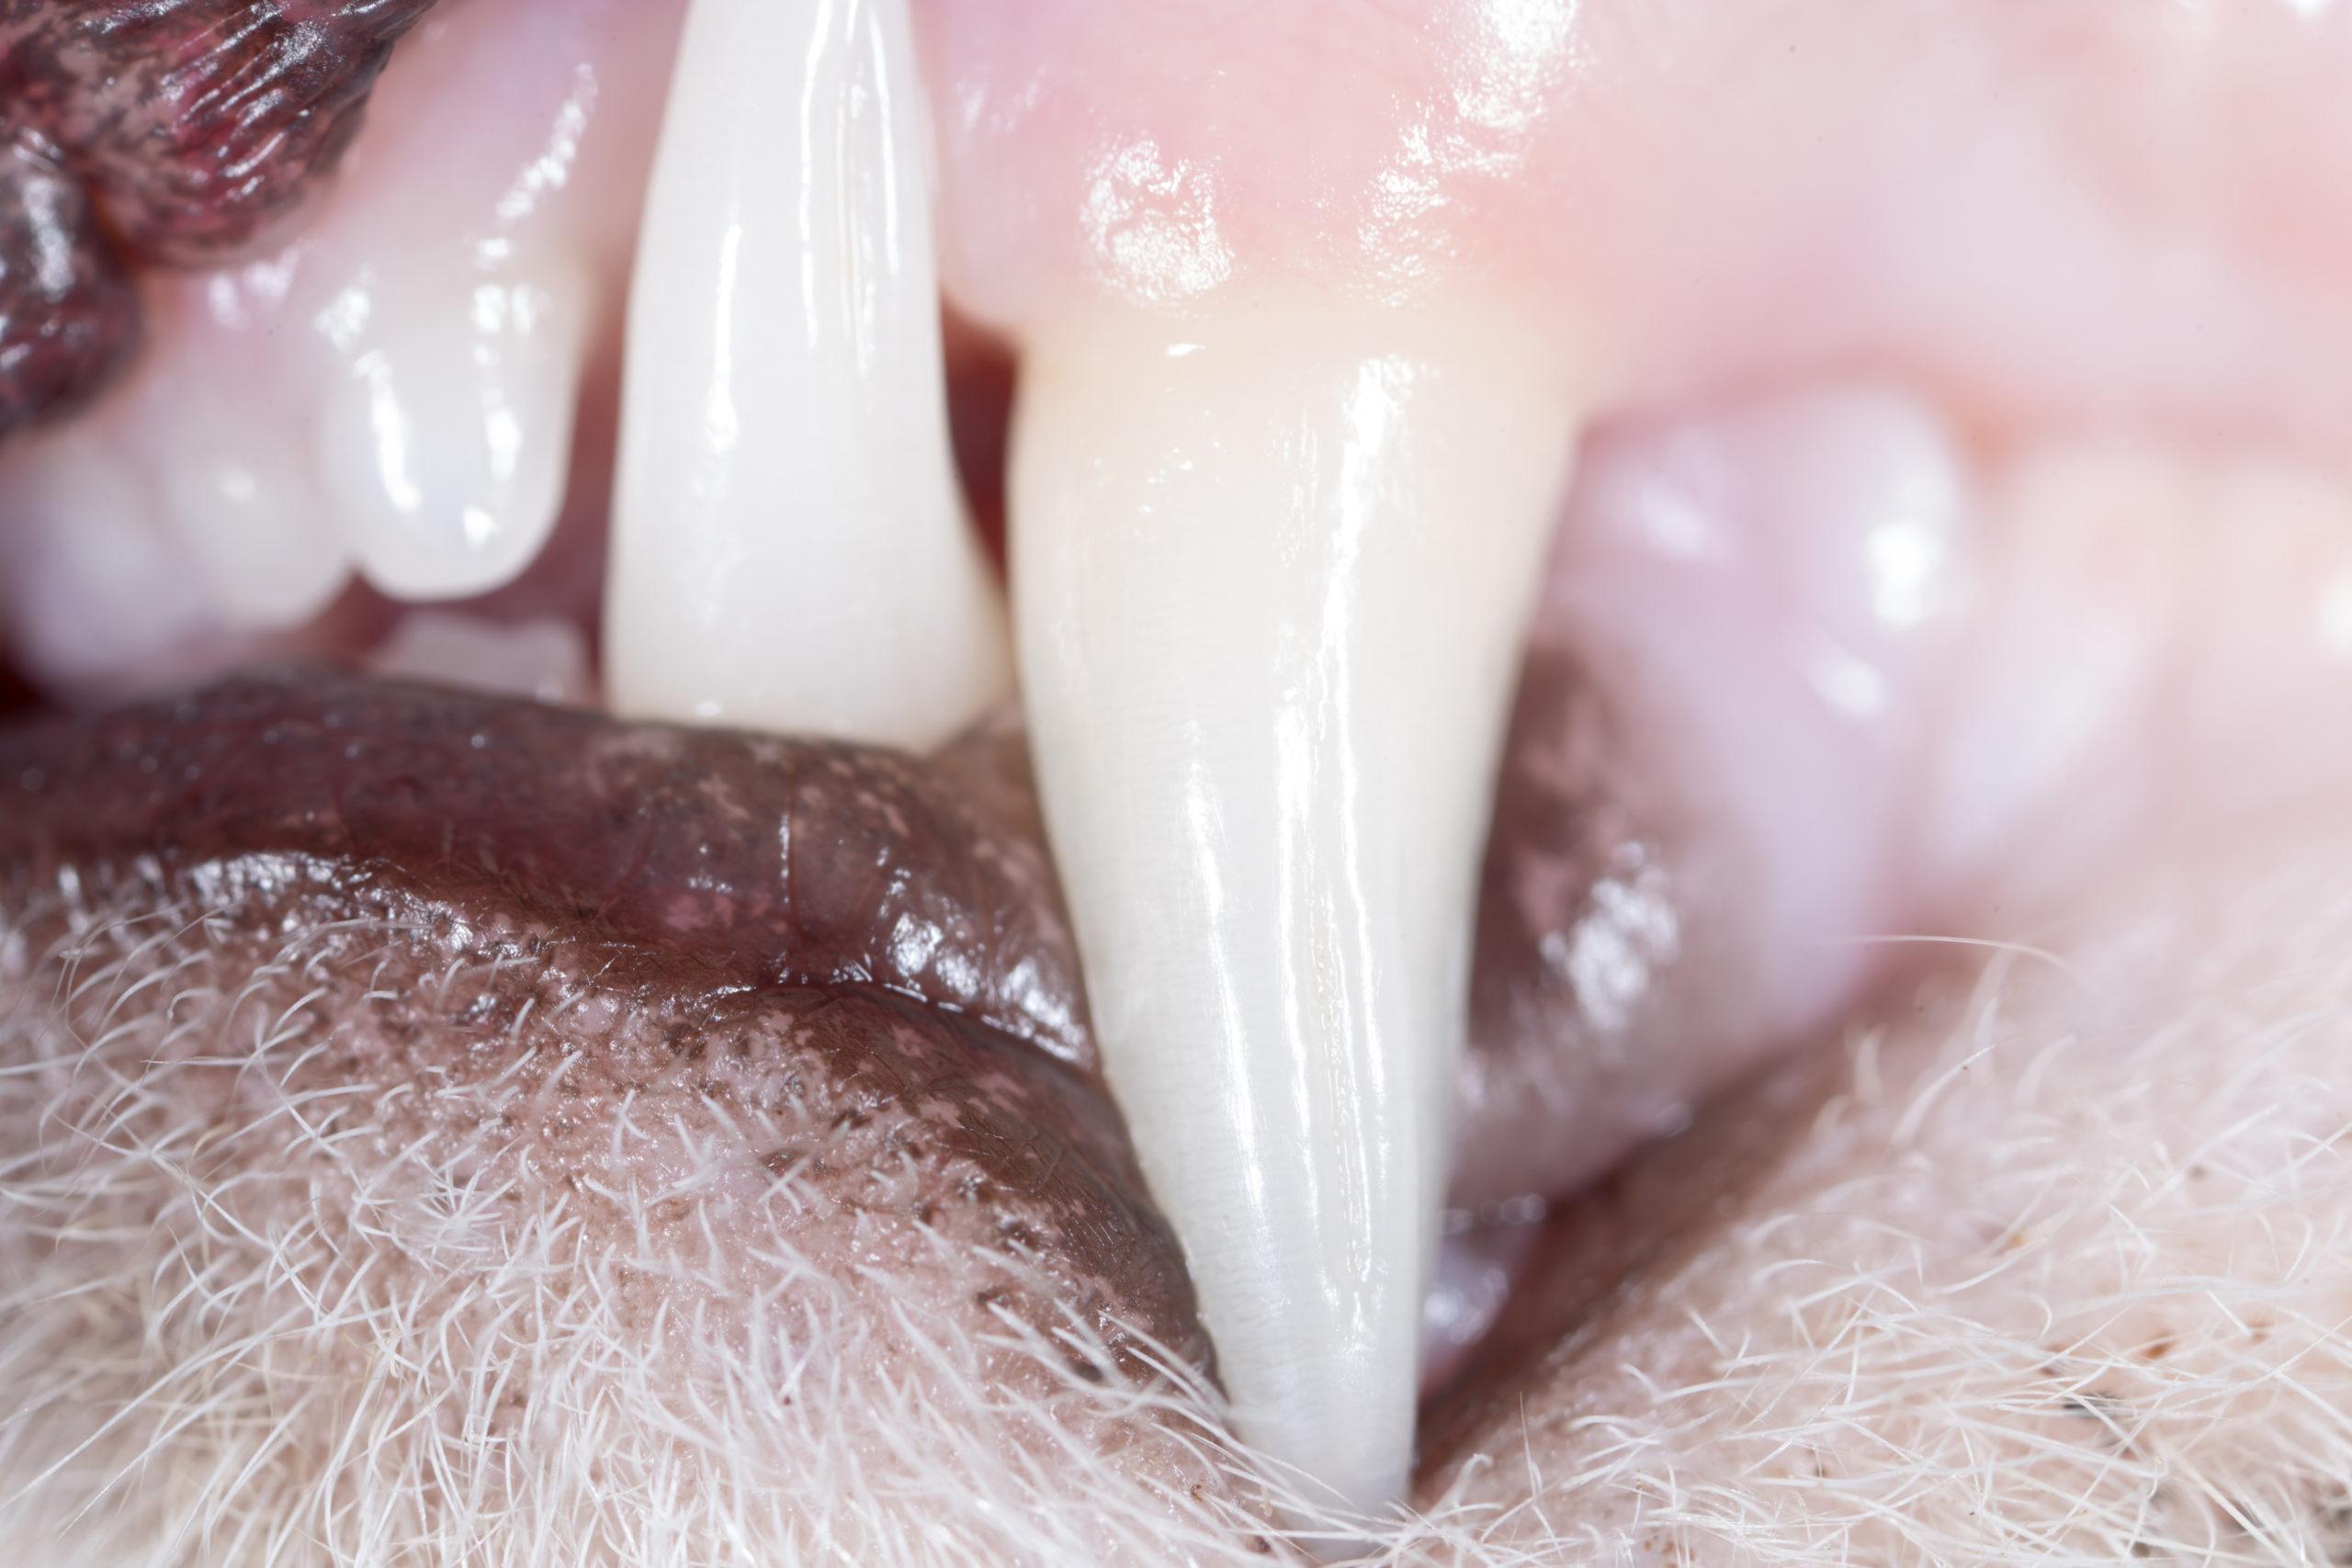 Pet Dental Health | Woolton Vets in Liverpool